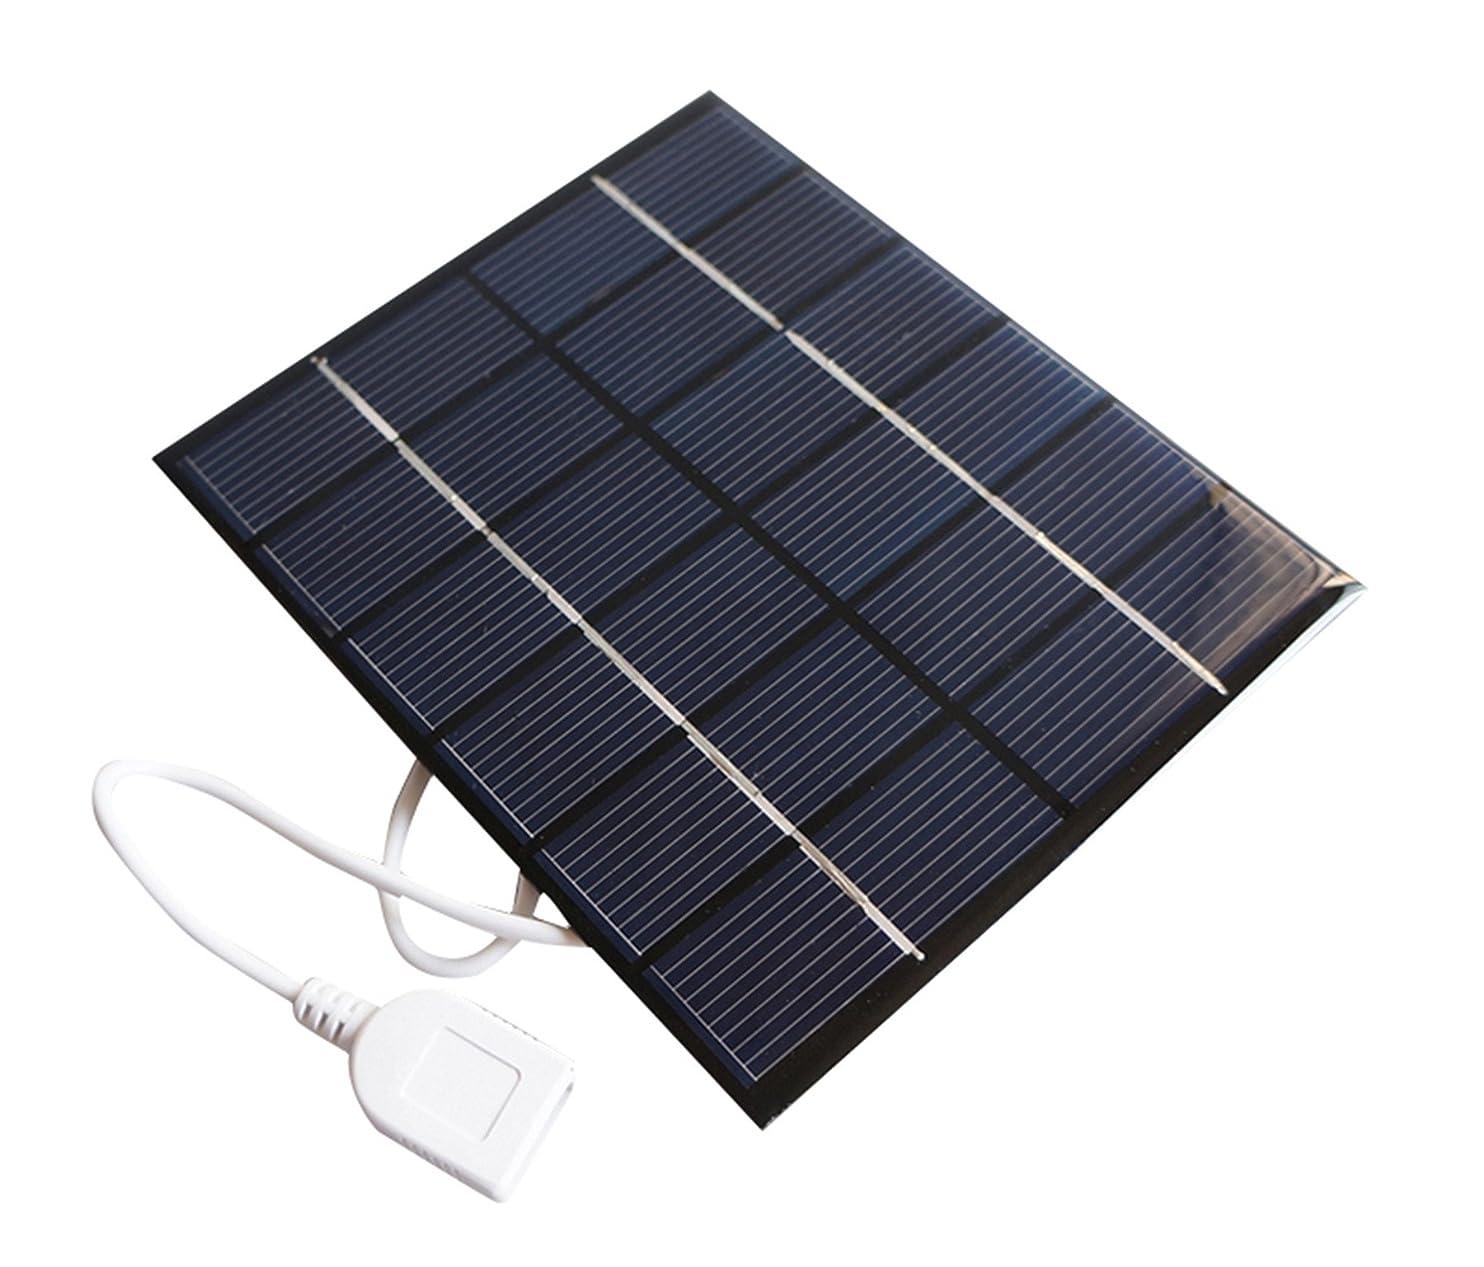 Sunnytech 2w 6v USB Mini Solar Panel Module DIY Polysilicon Solar Epoxy Cell Charger B032 ijcxzijfggo12